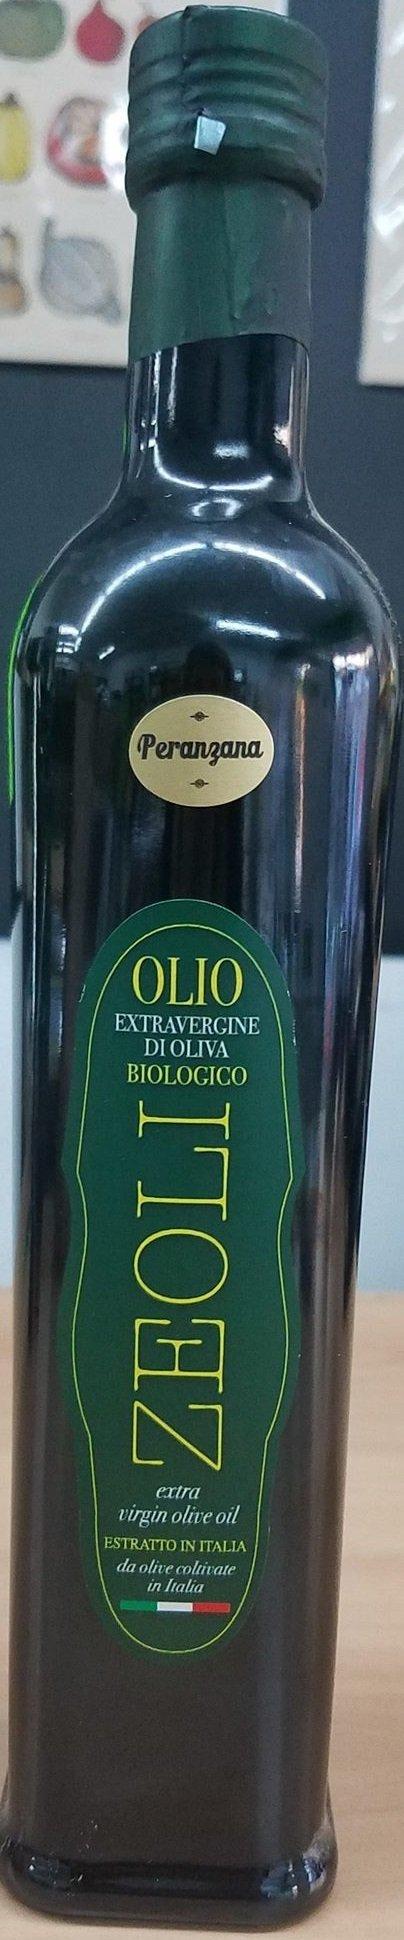 Zeoli - Huile d'olive extra vierge d'Italie Peranzana bio 500ml 18016